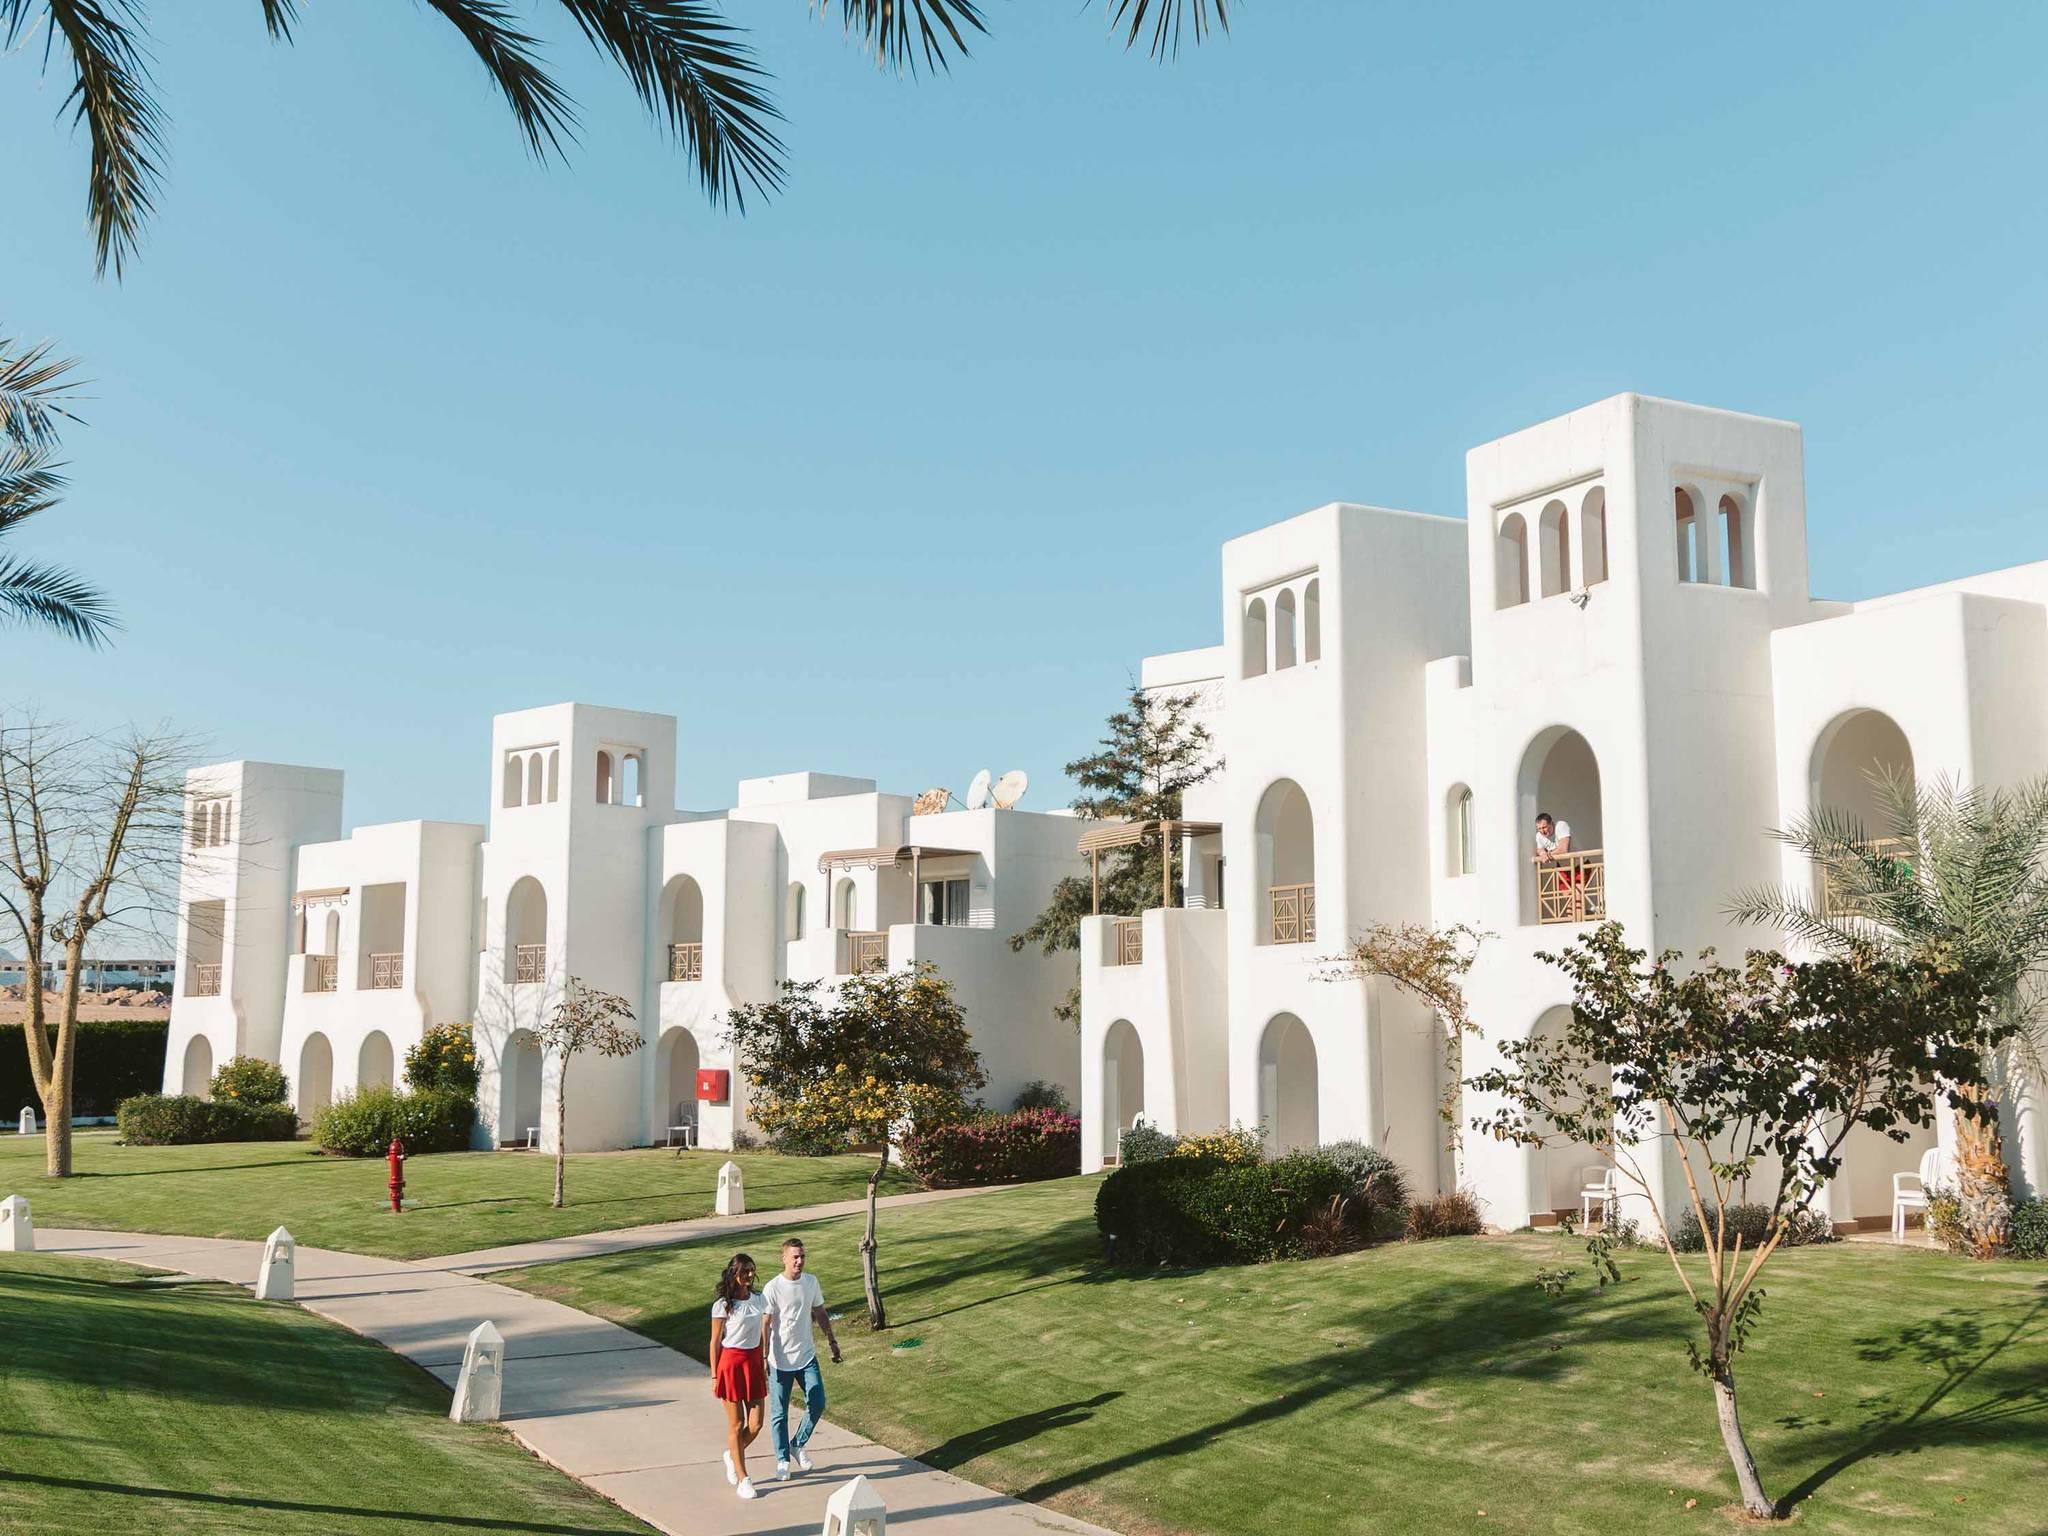 Hotel in SHARM EL SHEIKH - Novotel Sharm El Sheikh